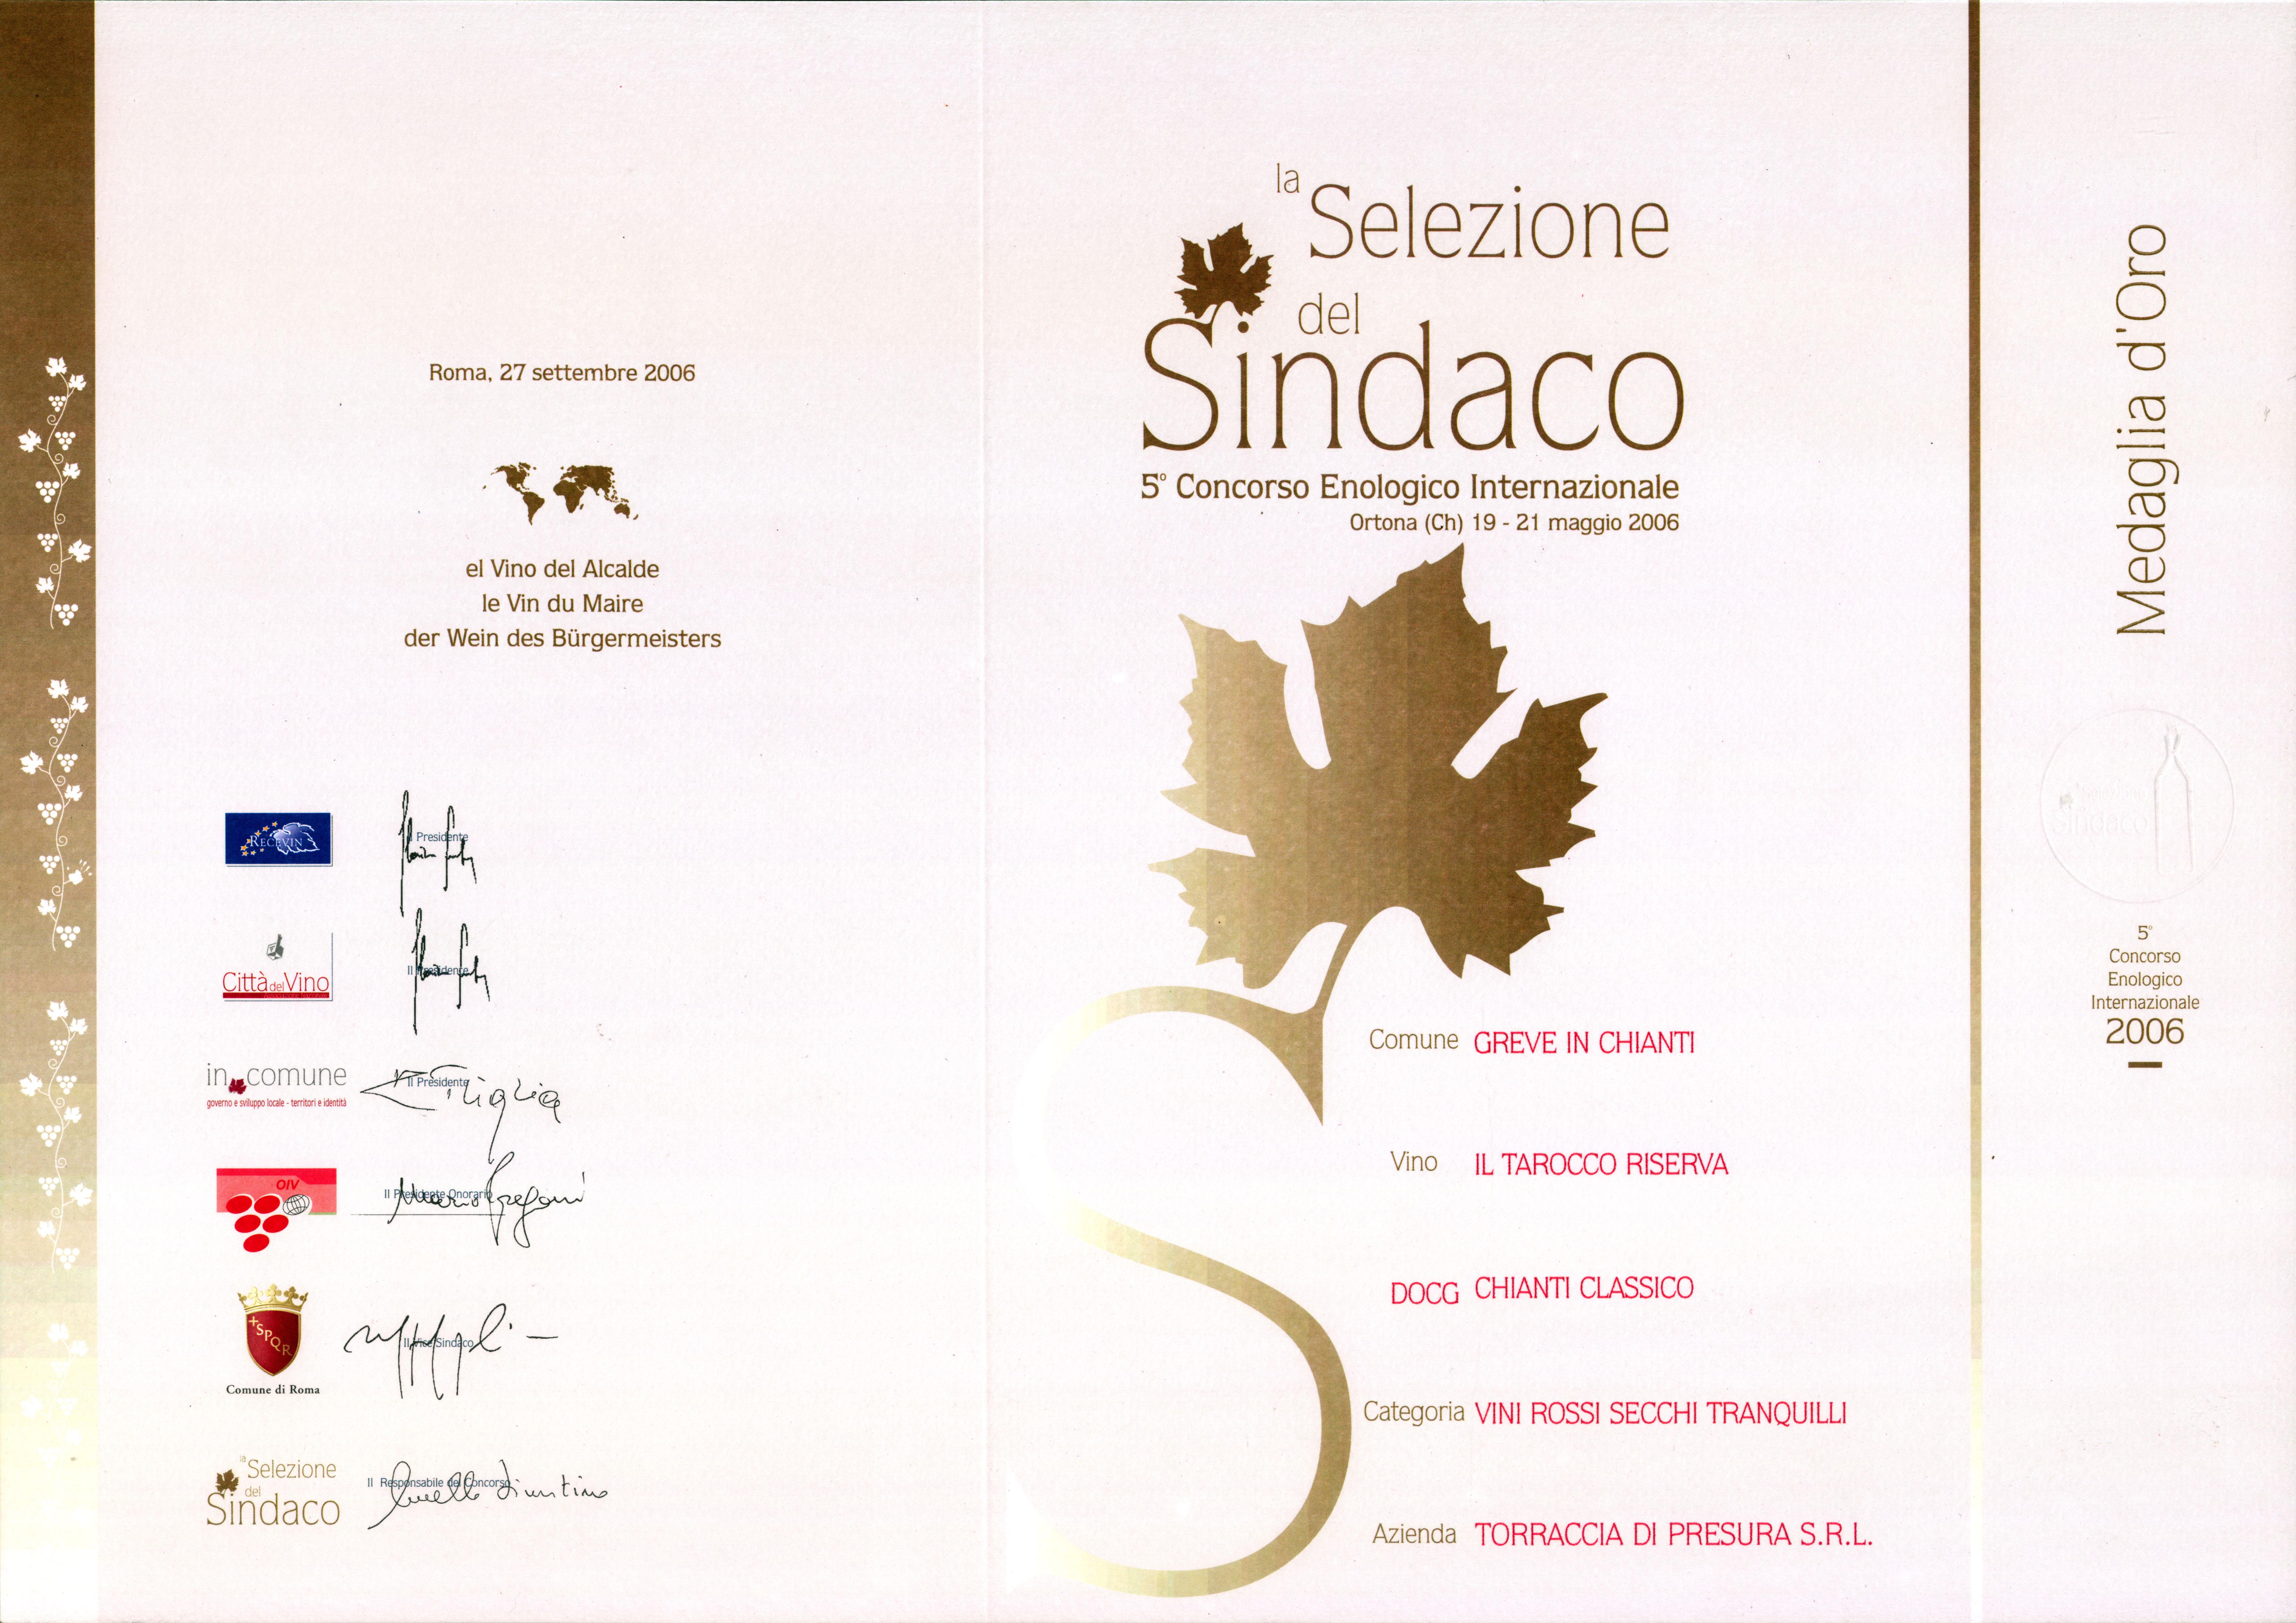 42 TARRIS 2003 Selez Sind 2006 2006